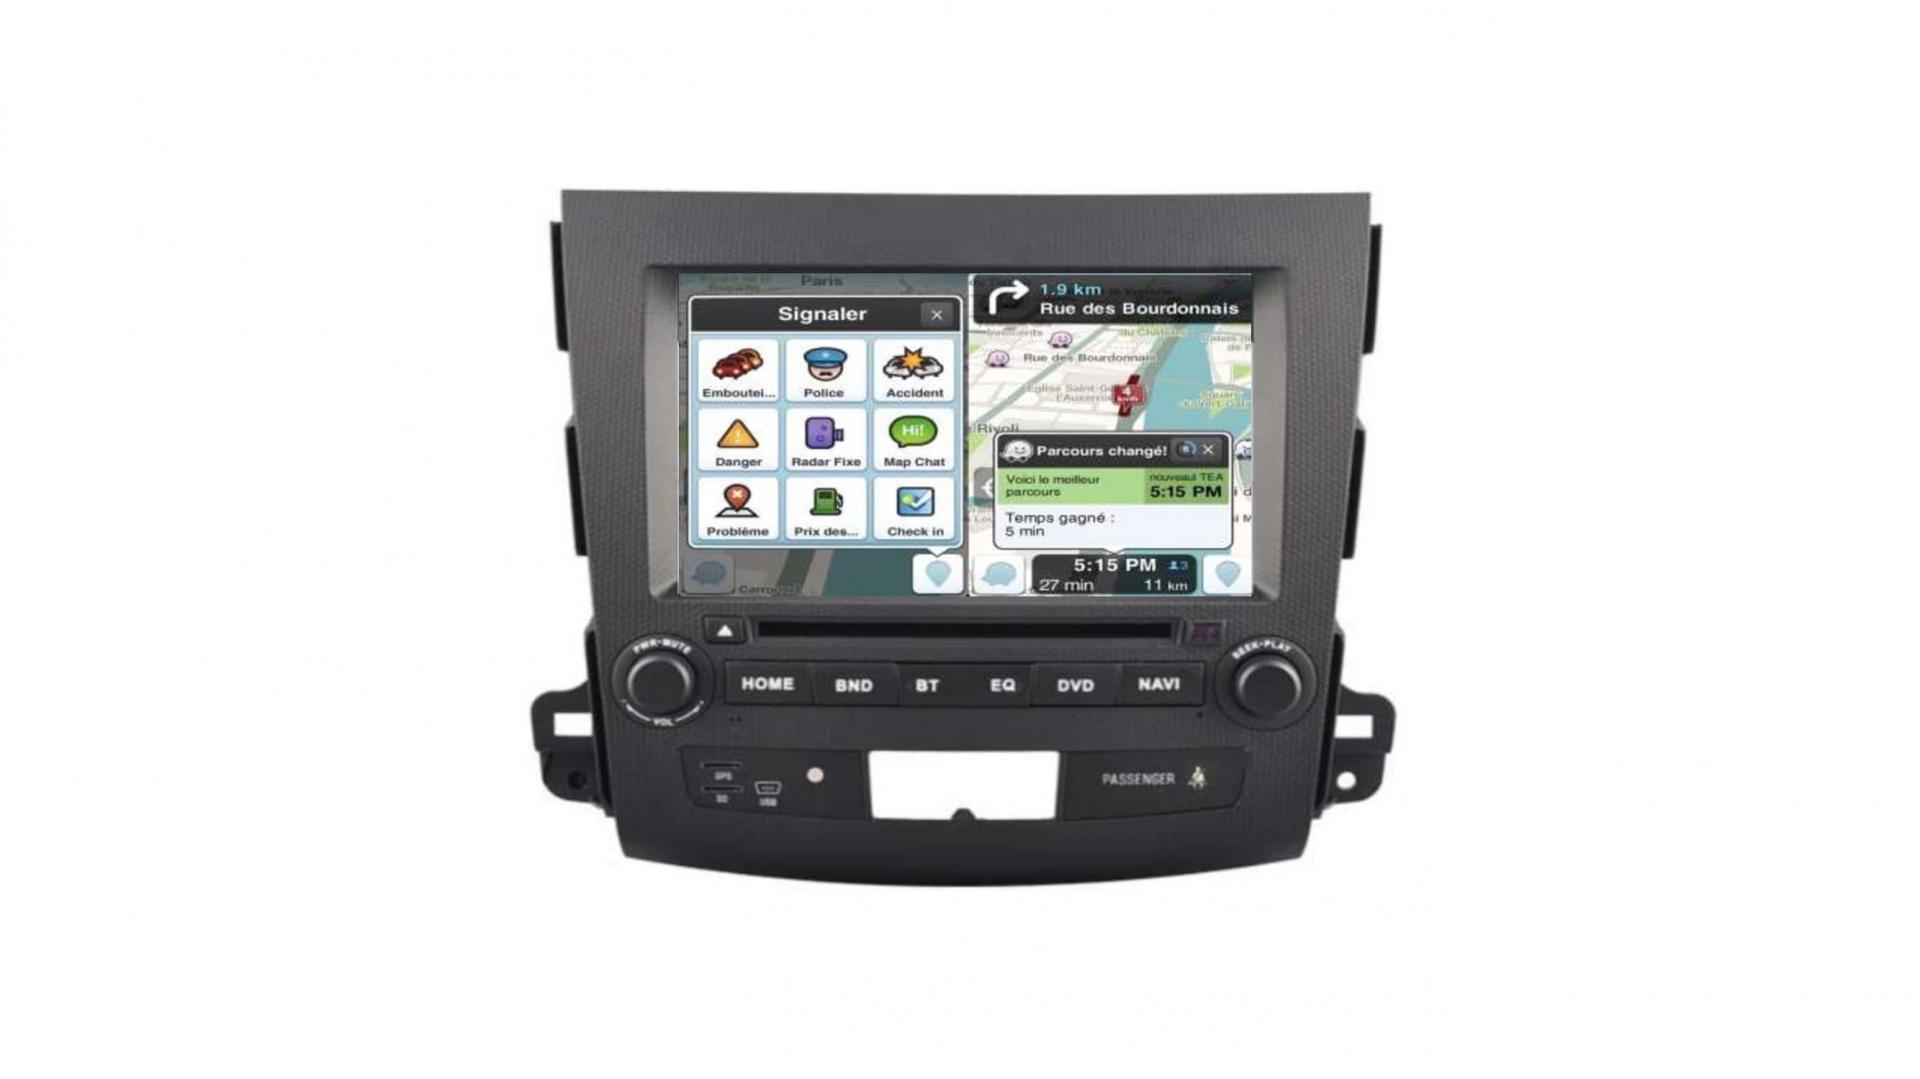 Autoradio gps bluetooth mitsubishi outlander asx android auto carplay camera de recul commande au volant2